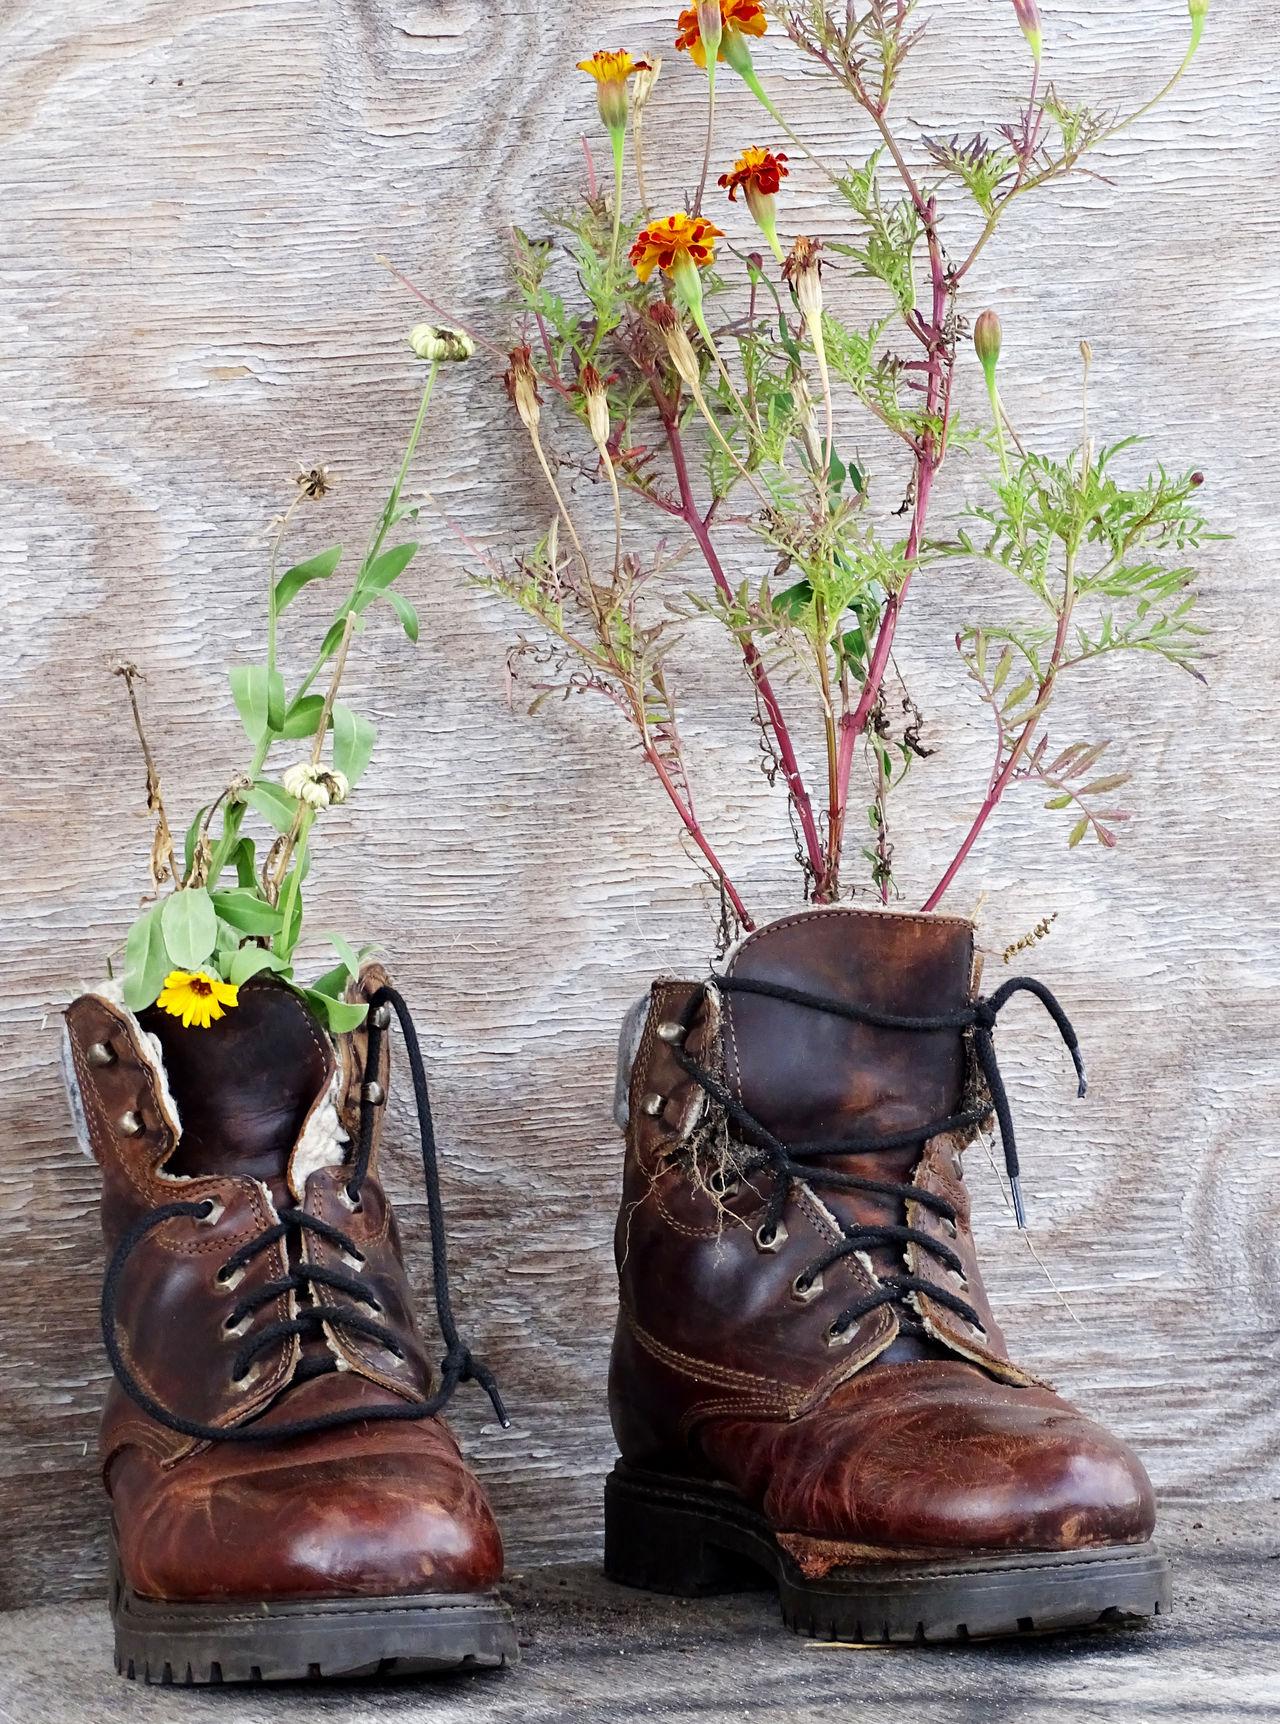 Shoe Close-up Creativity Creative Gardening Urban Nature Urban Gardening Flower Flowers,Plants & Garden Flower Collection EyeEm Gallery EyeEm Best Shots Tempelhofer Feld 2015